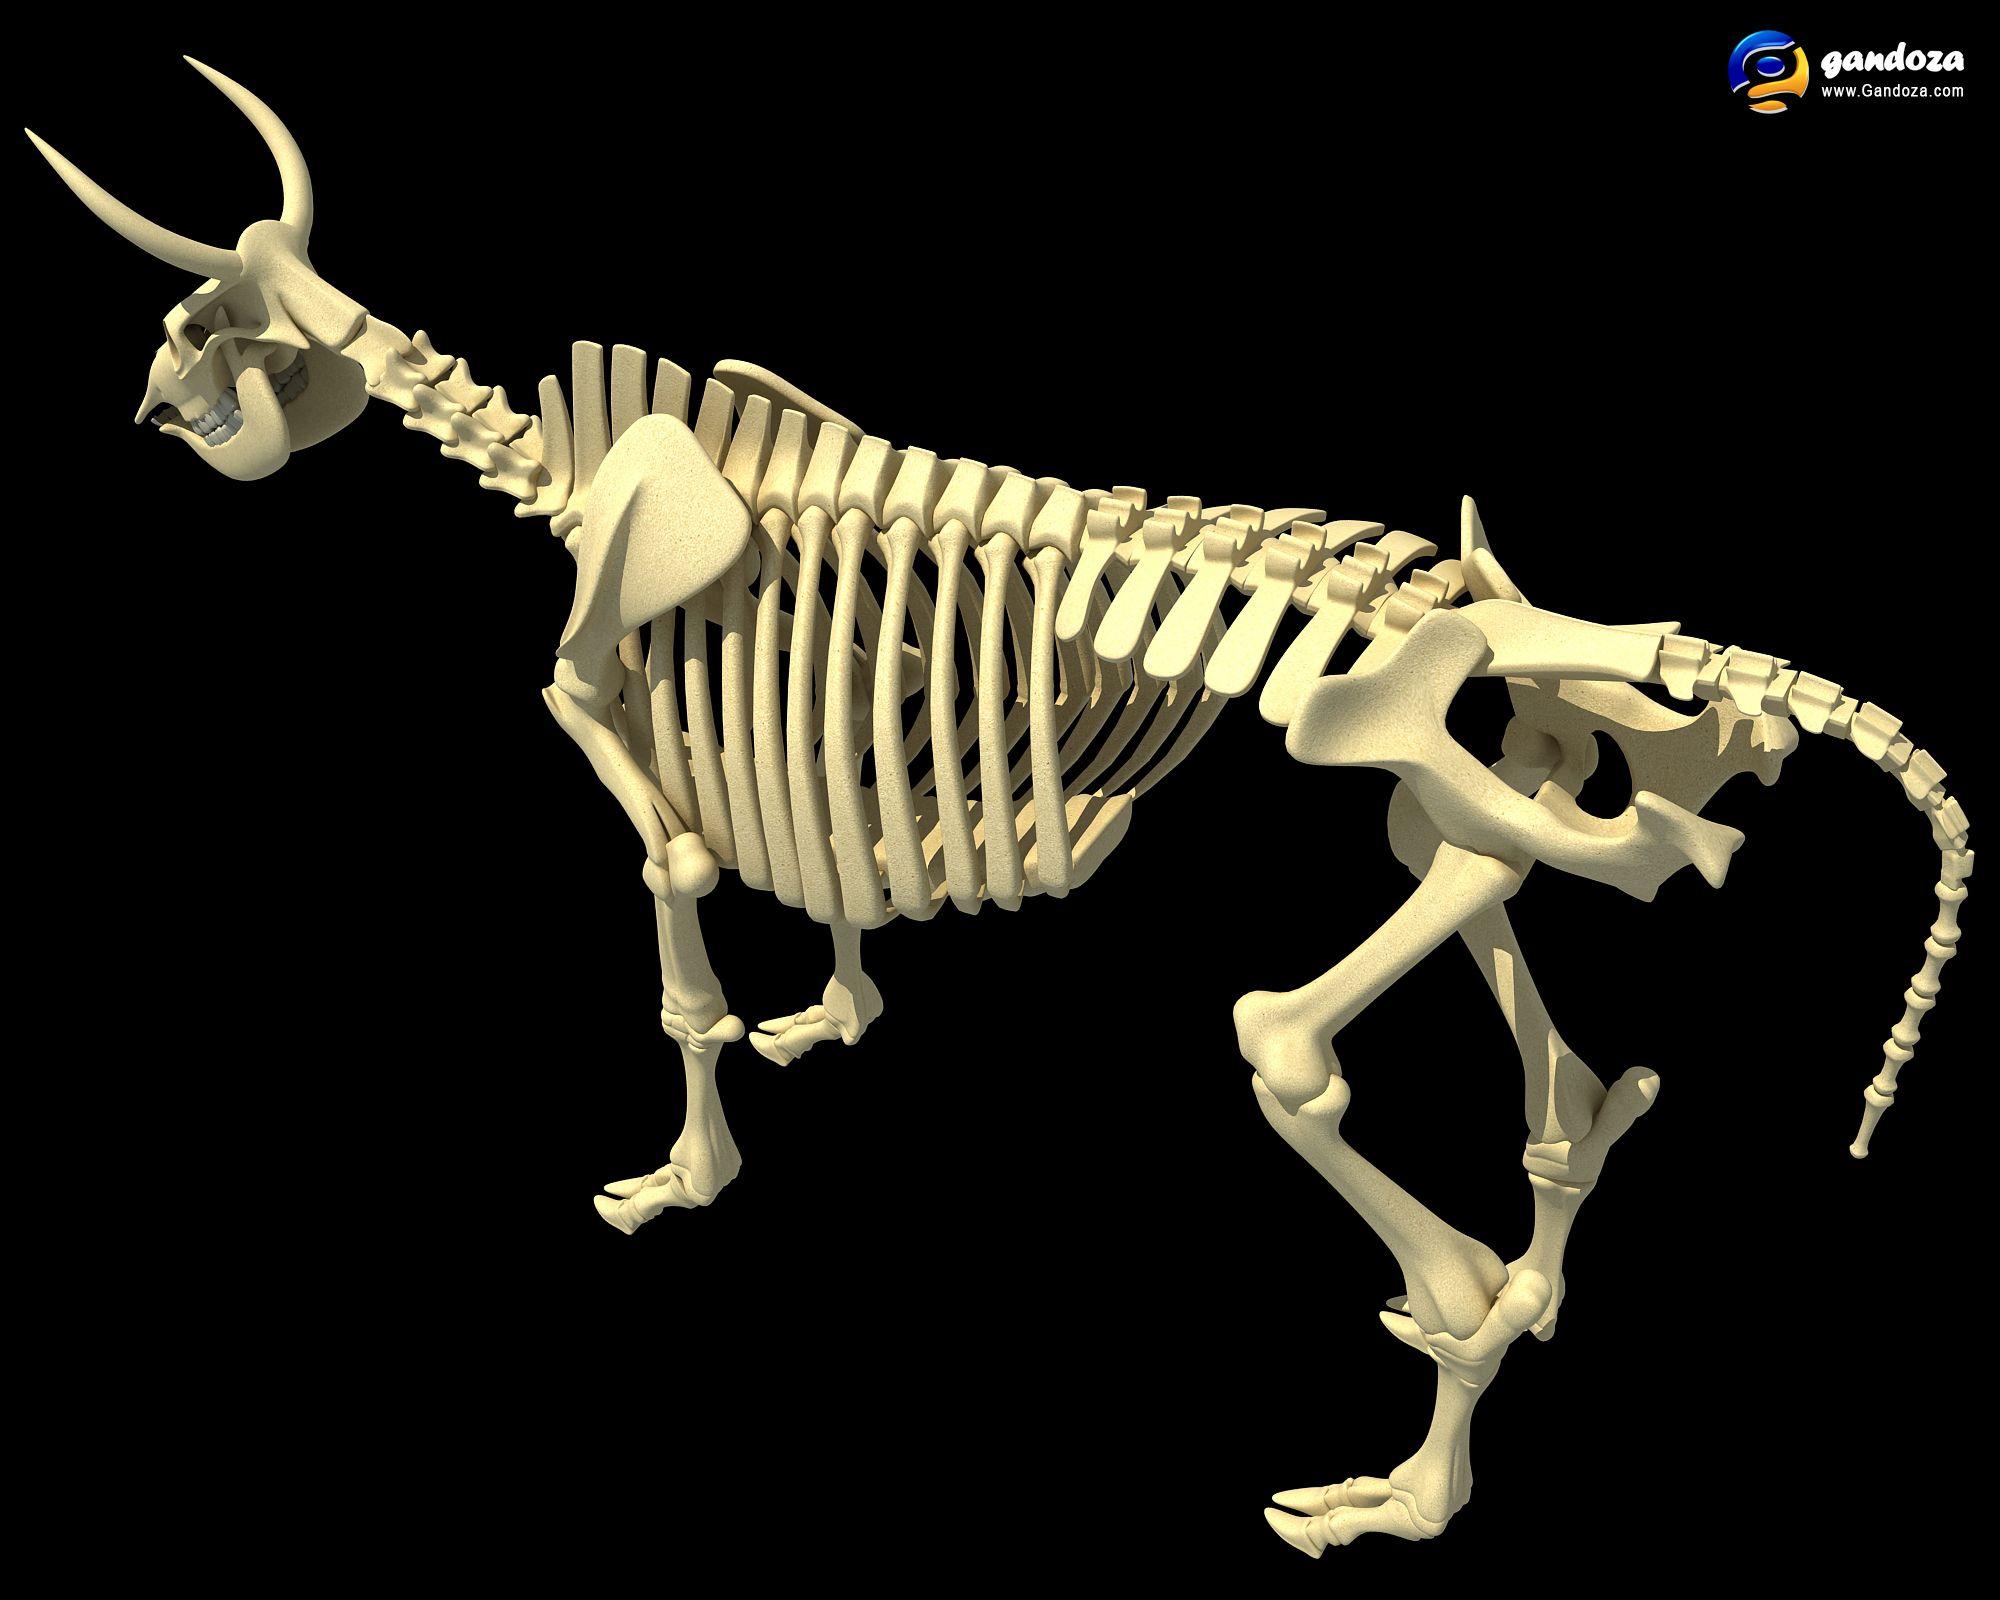 http://www.gandoza.com/ Cow Skeleton | Bones | Pinterest